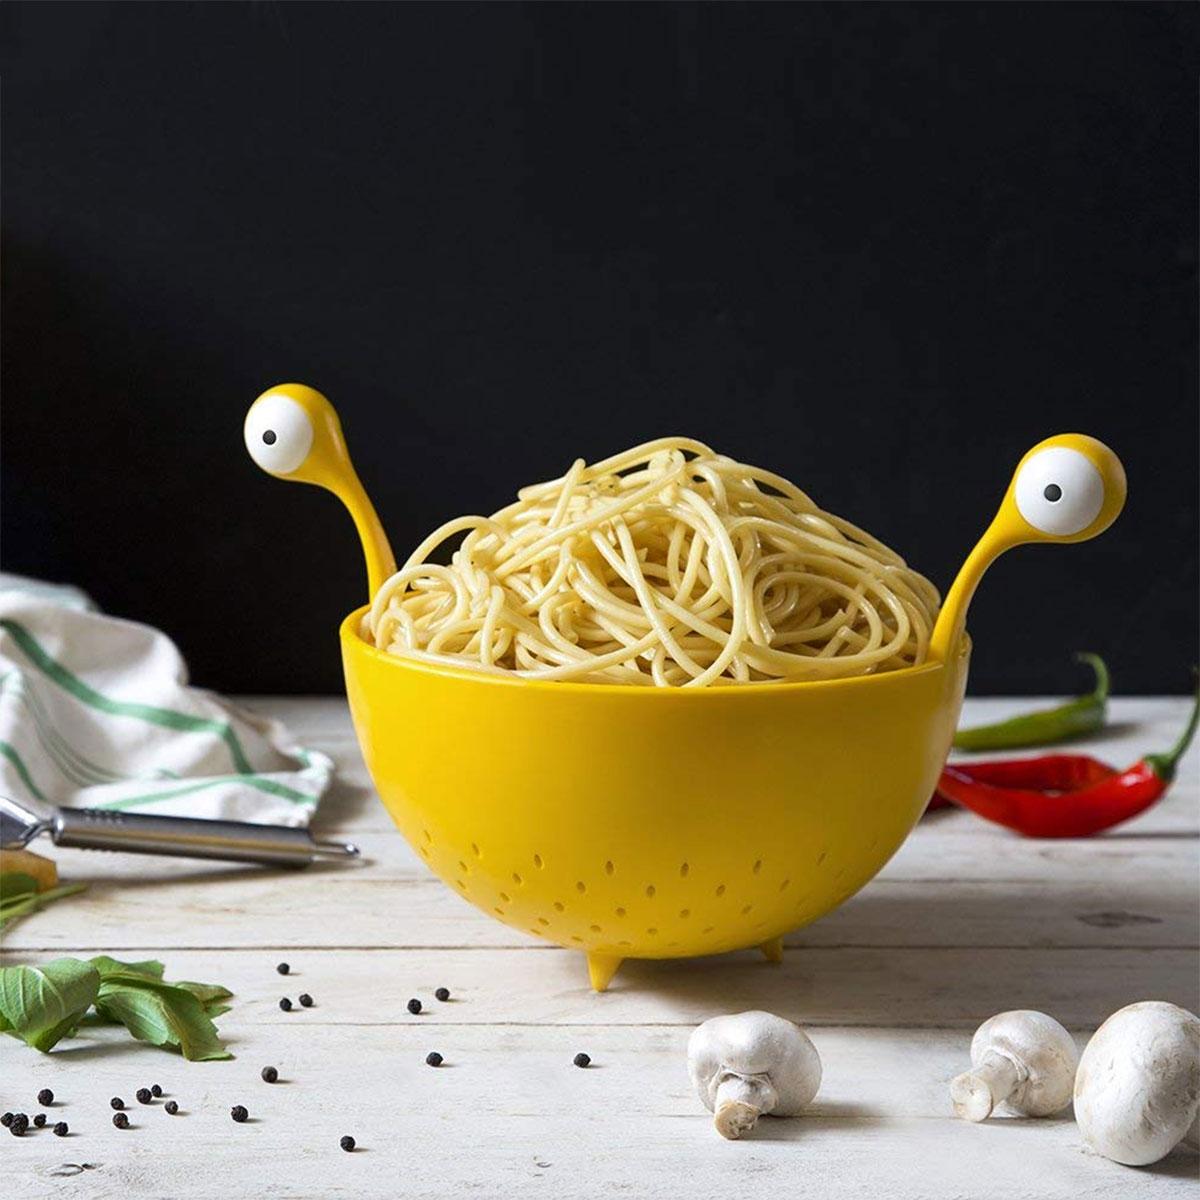 Fliegendes Spaghetti-Monster Nudelsieb